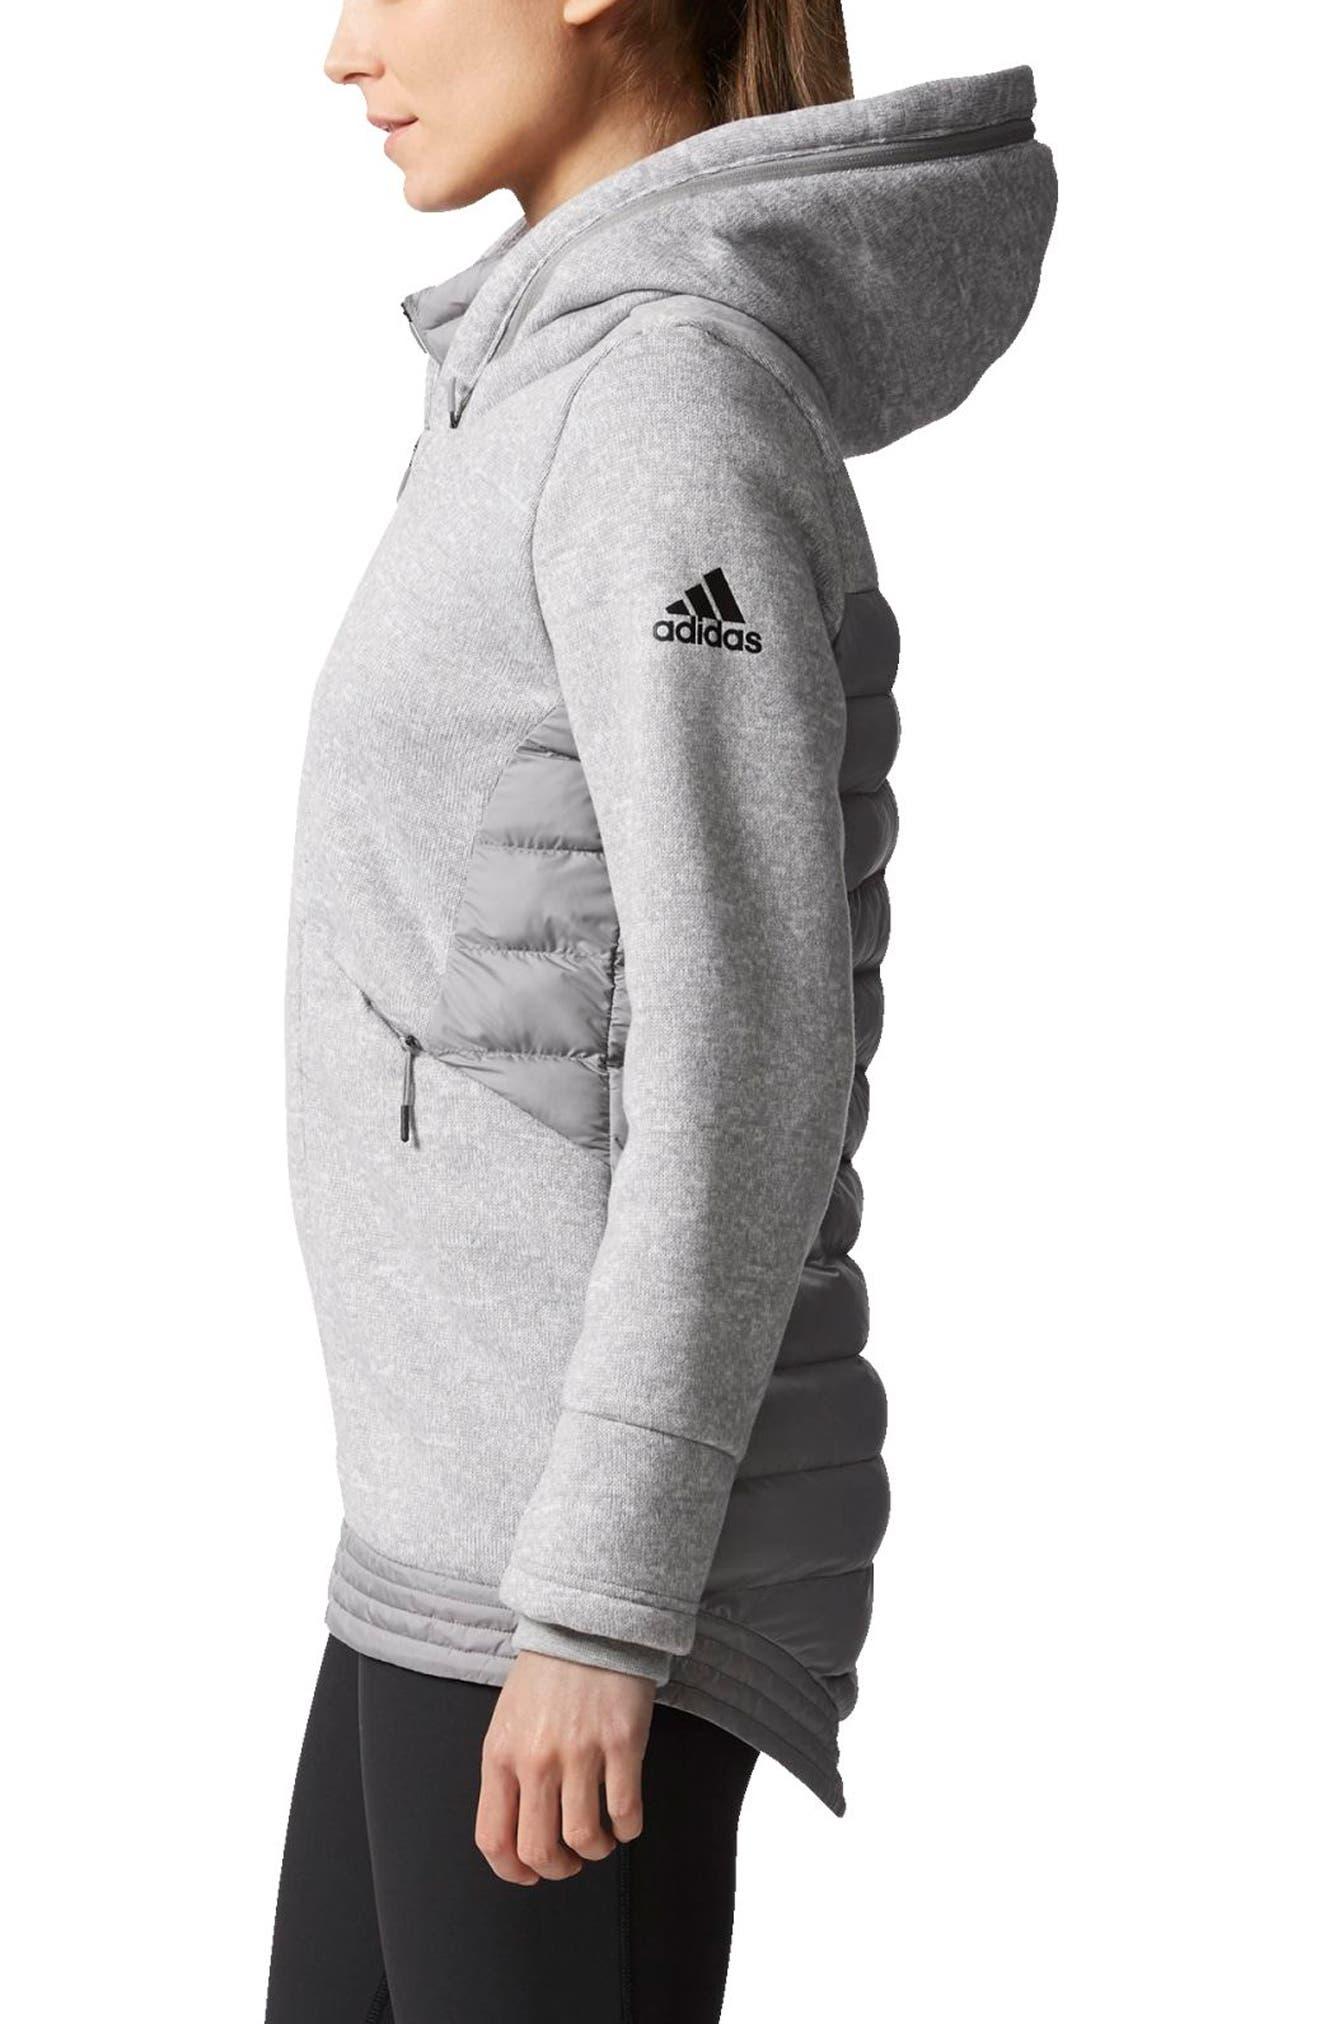 Nuvic Hybrid 2 Fleece/Puffer Jacket,                             Alternate thumbnail 3, color,                             Medium Grey Heather/Solid Grey